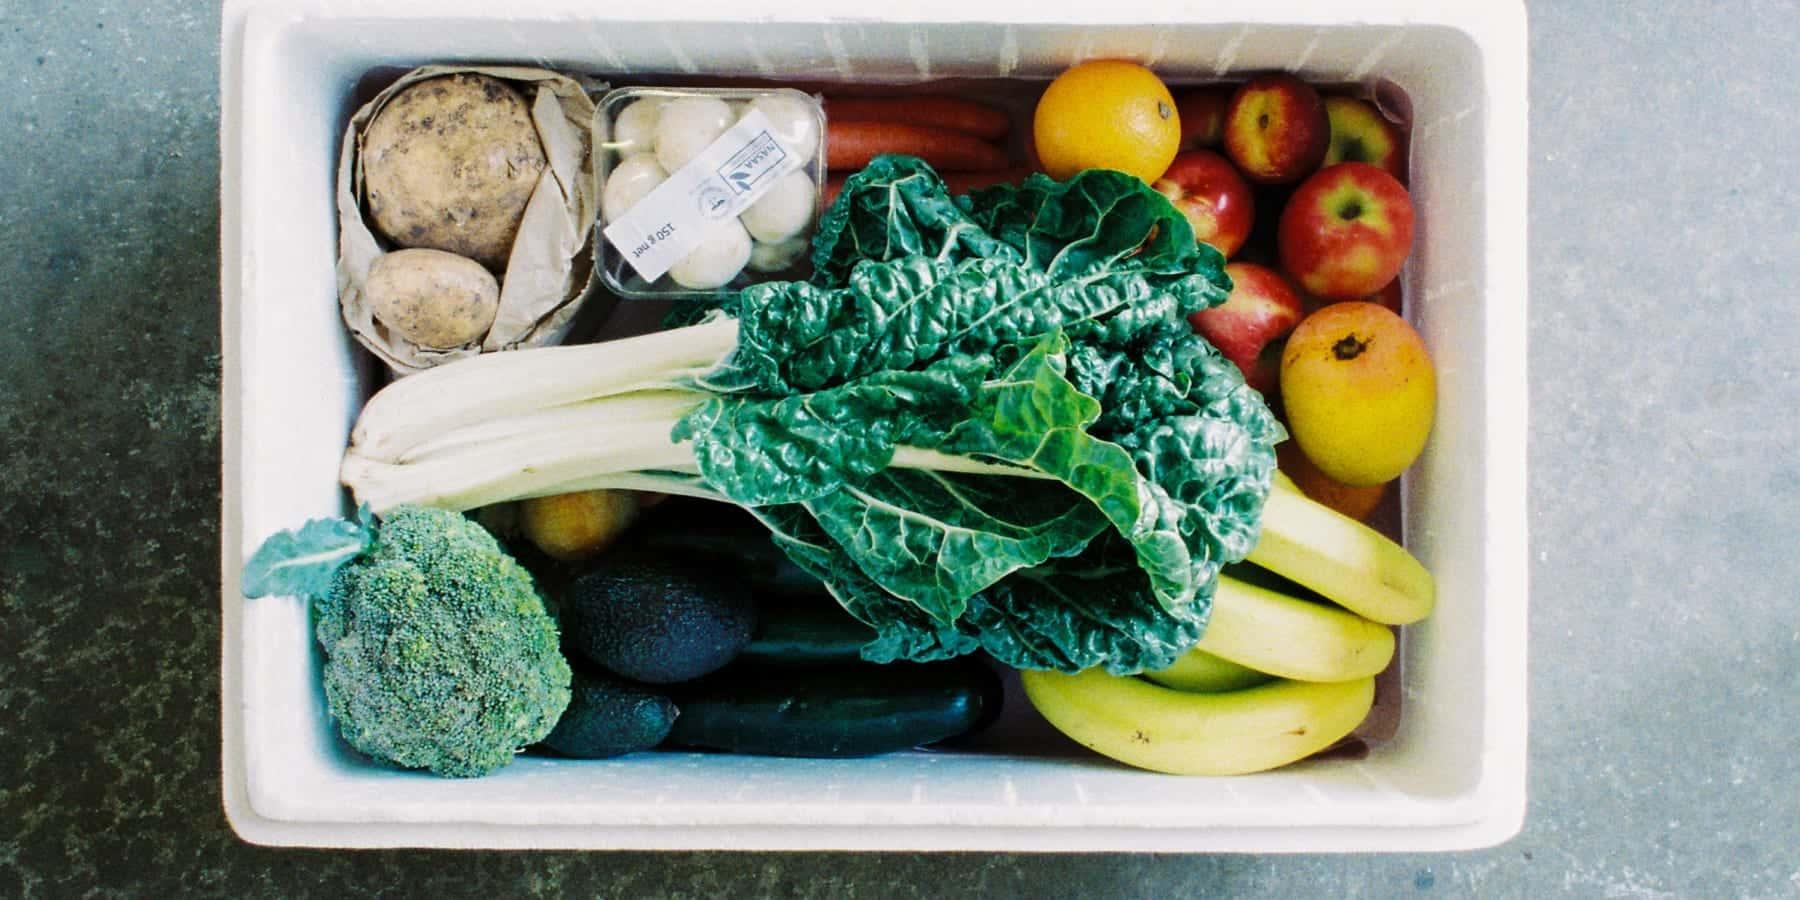 LA発、低所得者に新鮮な野菜を届けるアプリ「tangelo」